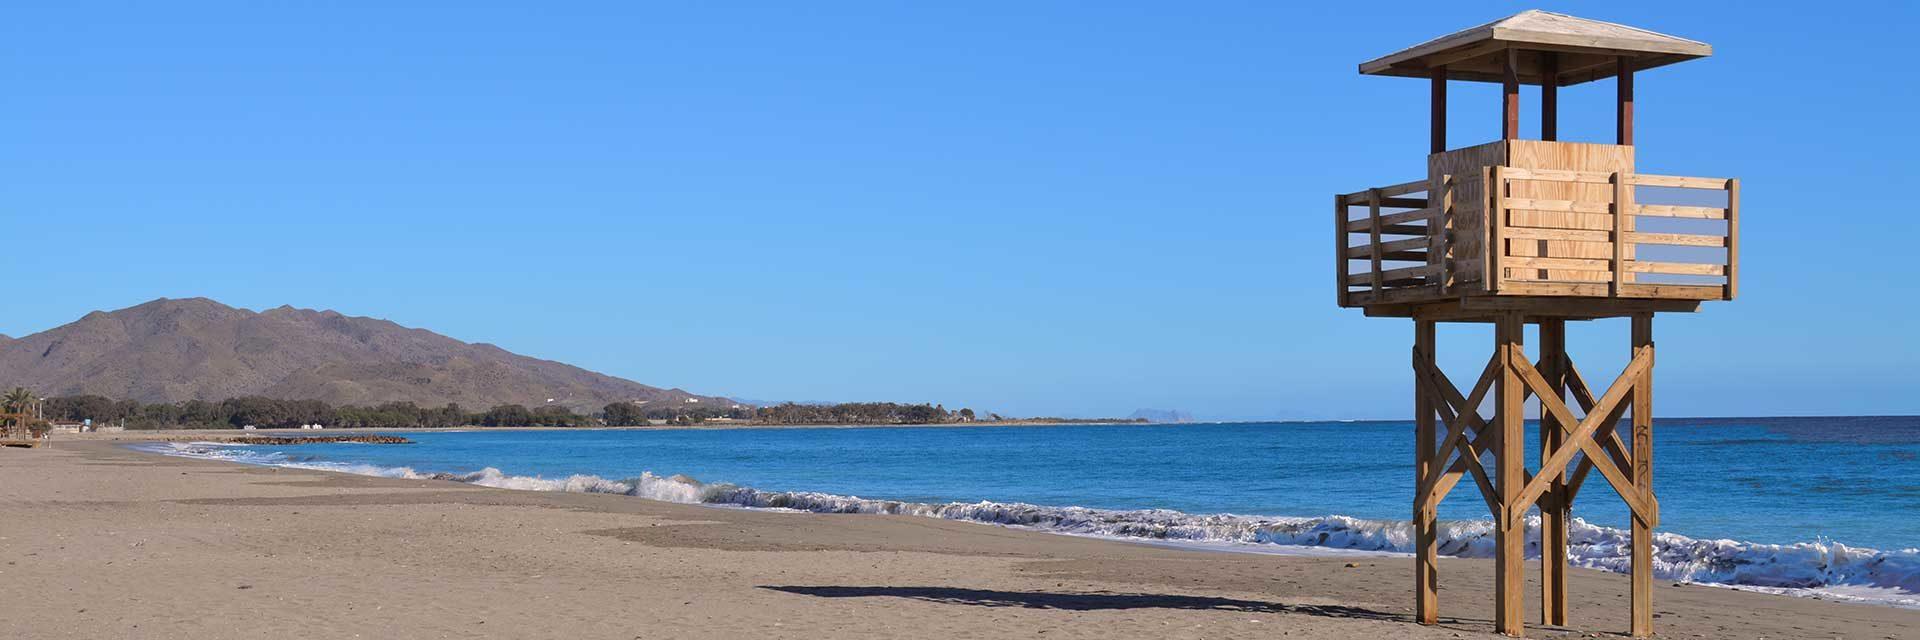 Playa Vera